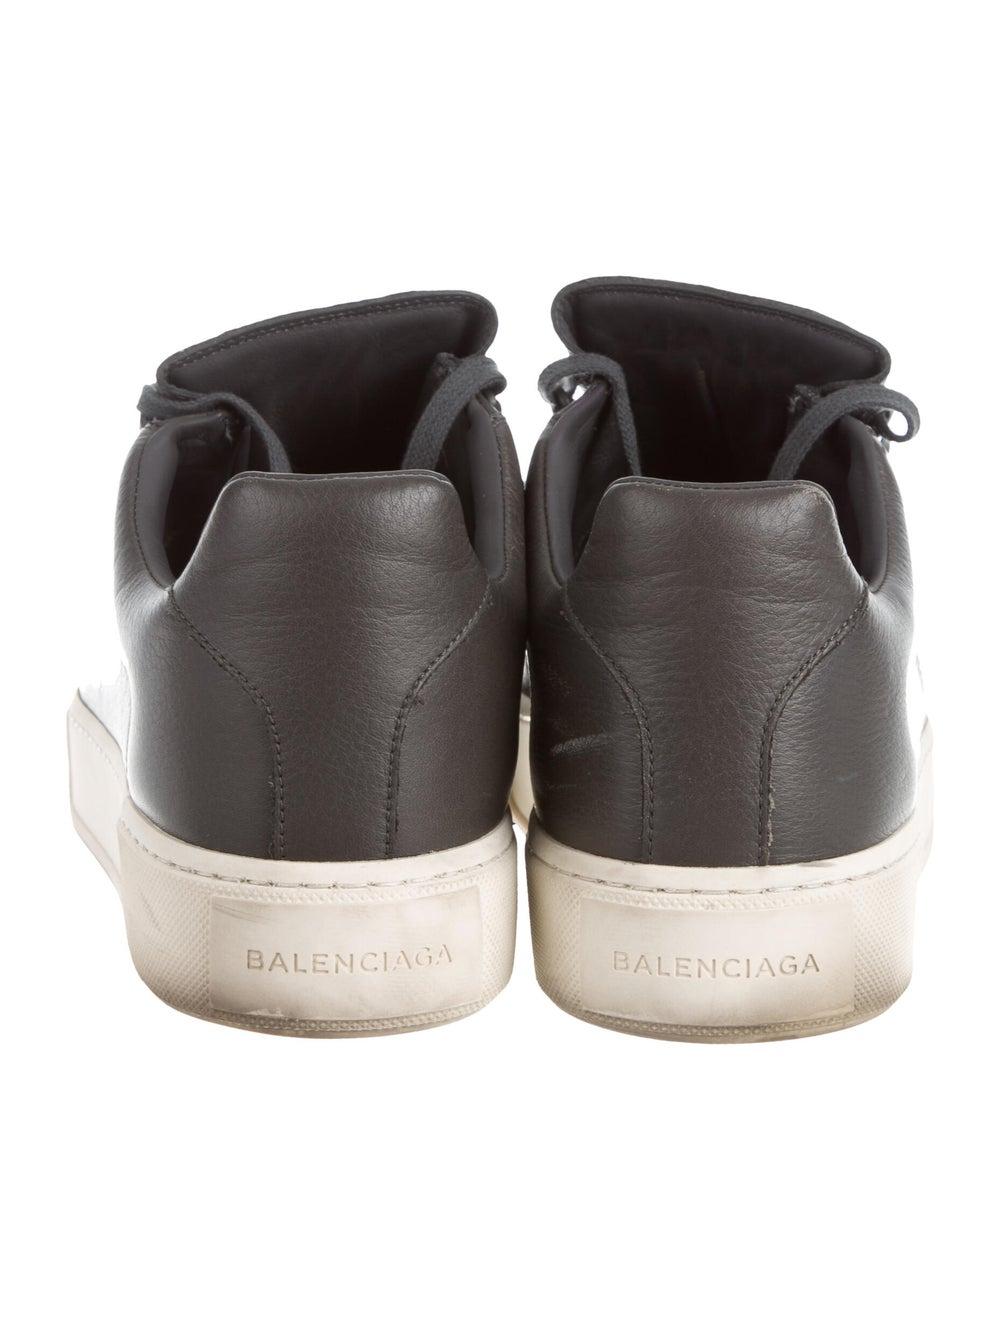 Balenciaga Cap-Toe Low-Top Sneakers Gris - image 4